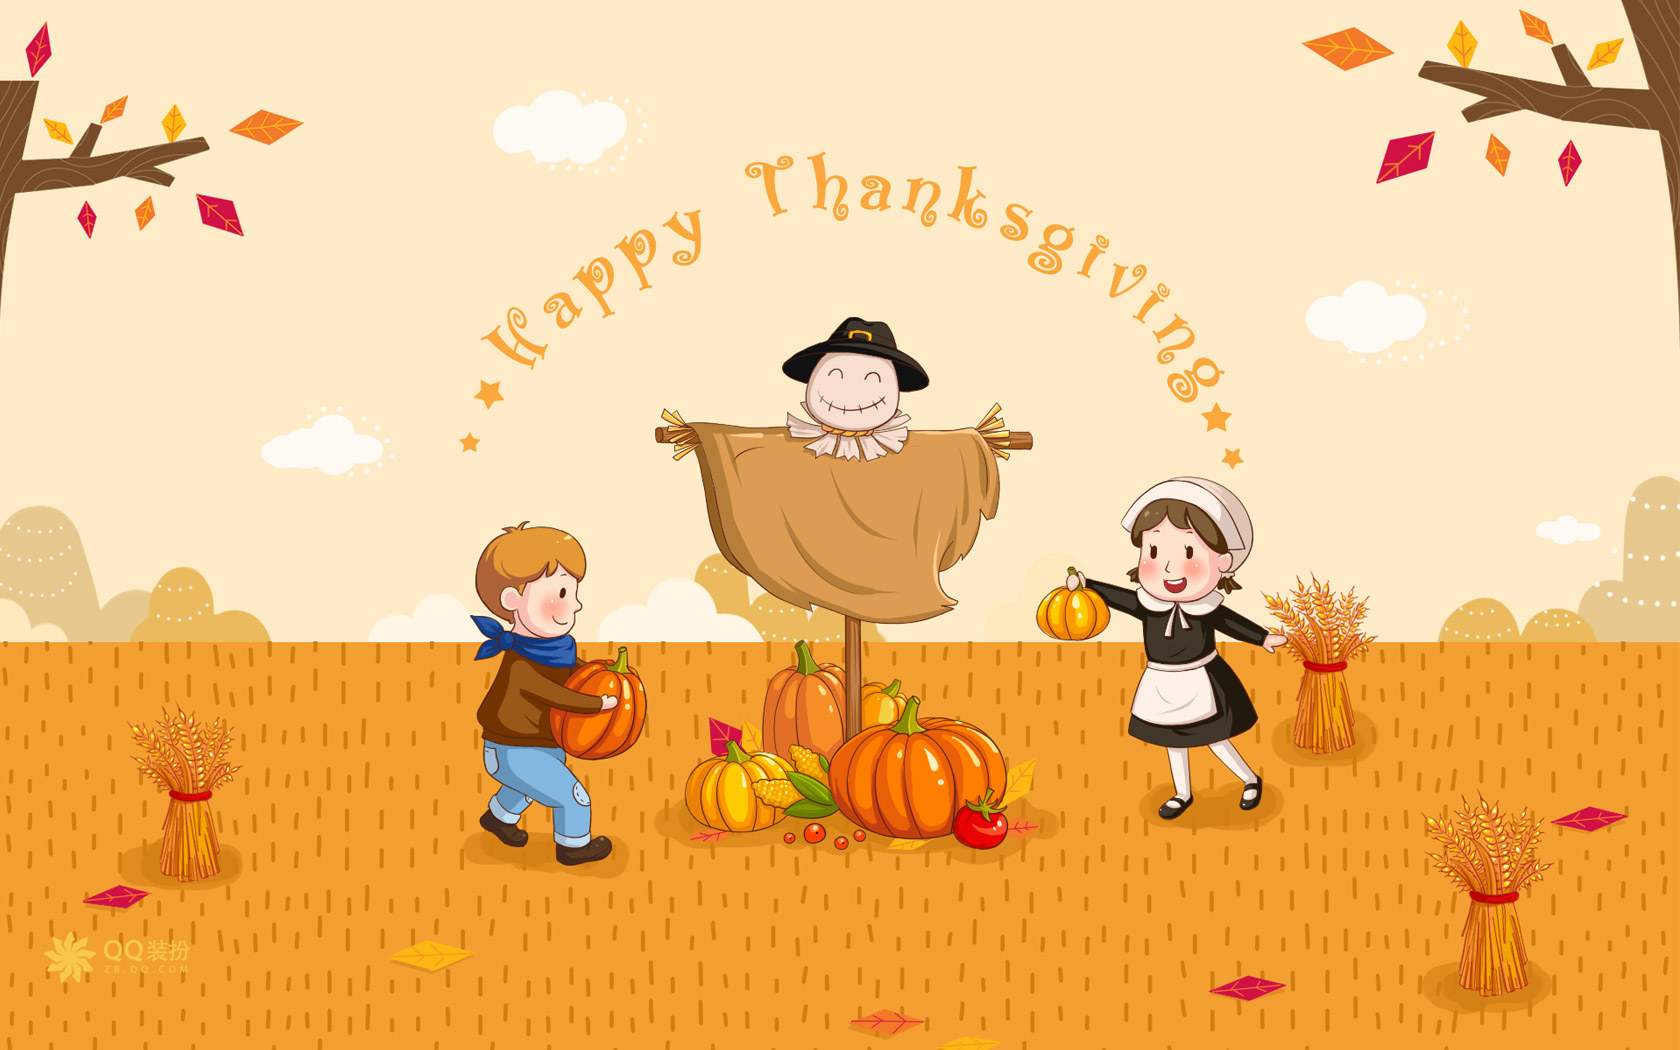 【感恩节儿歌】Thanksgiving day 相关视频分享值得入手!